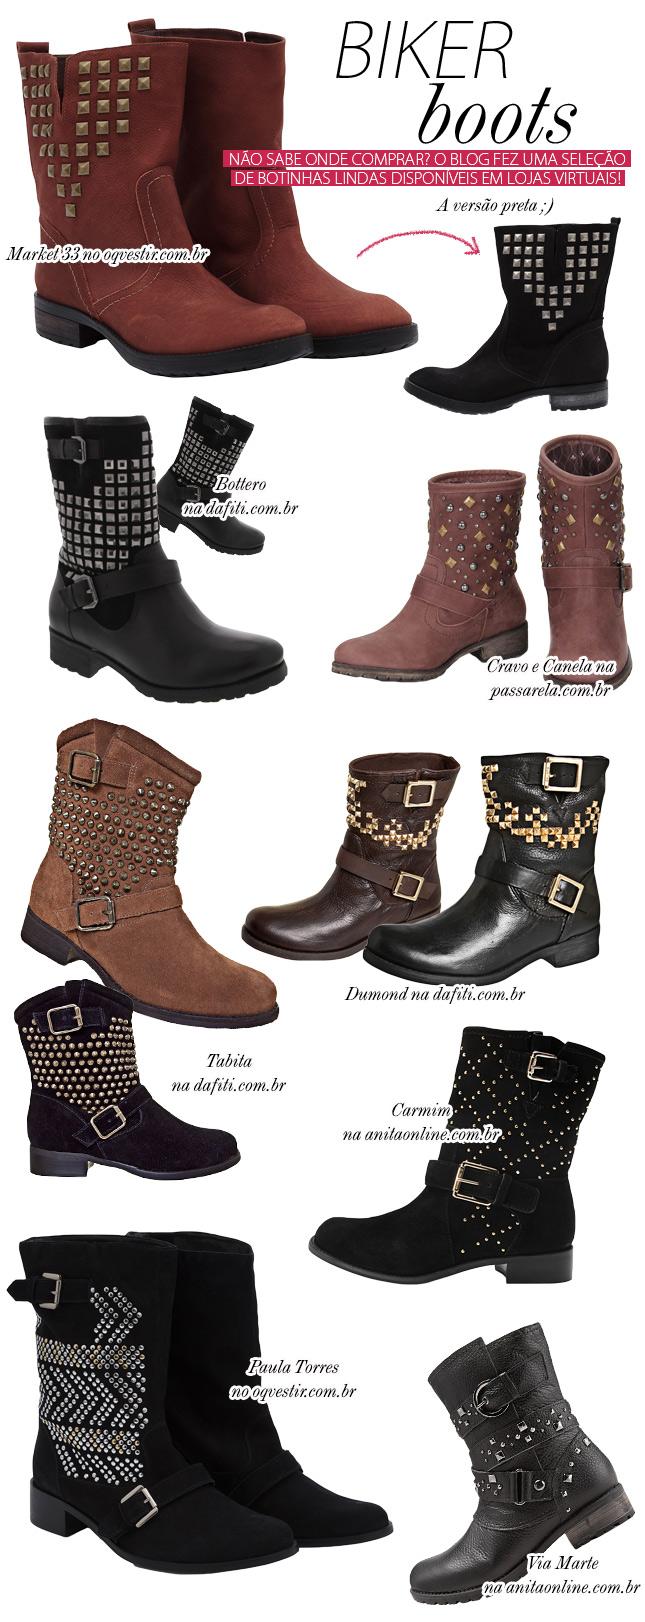 biker boots blog de moda onde comprar dica loja virtual anita online oh my closet dafiti oqvestir passarela botinha inverno 2013